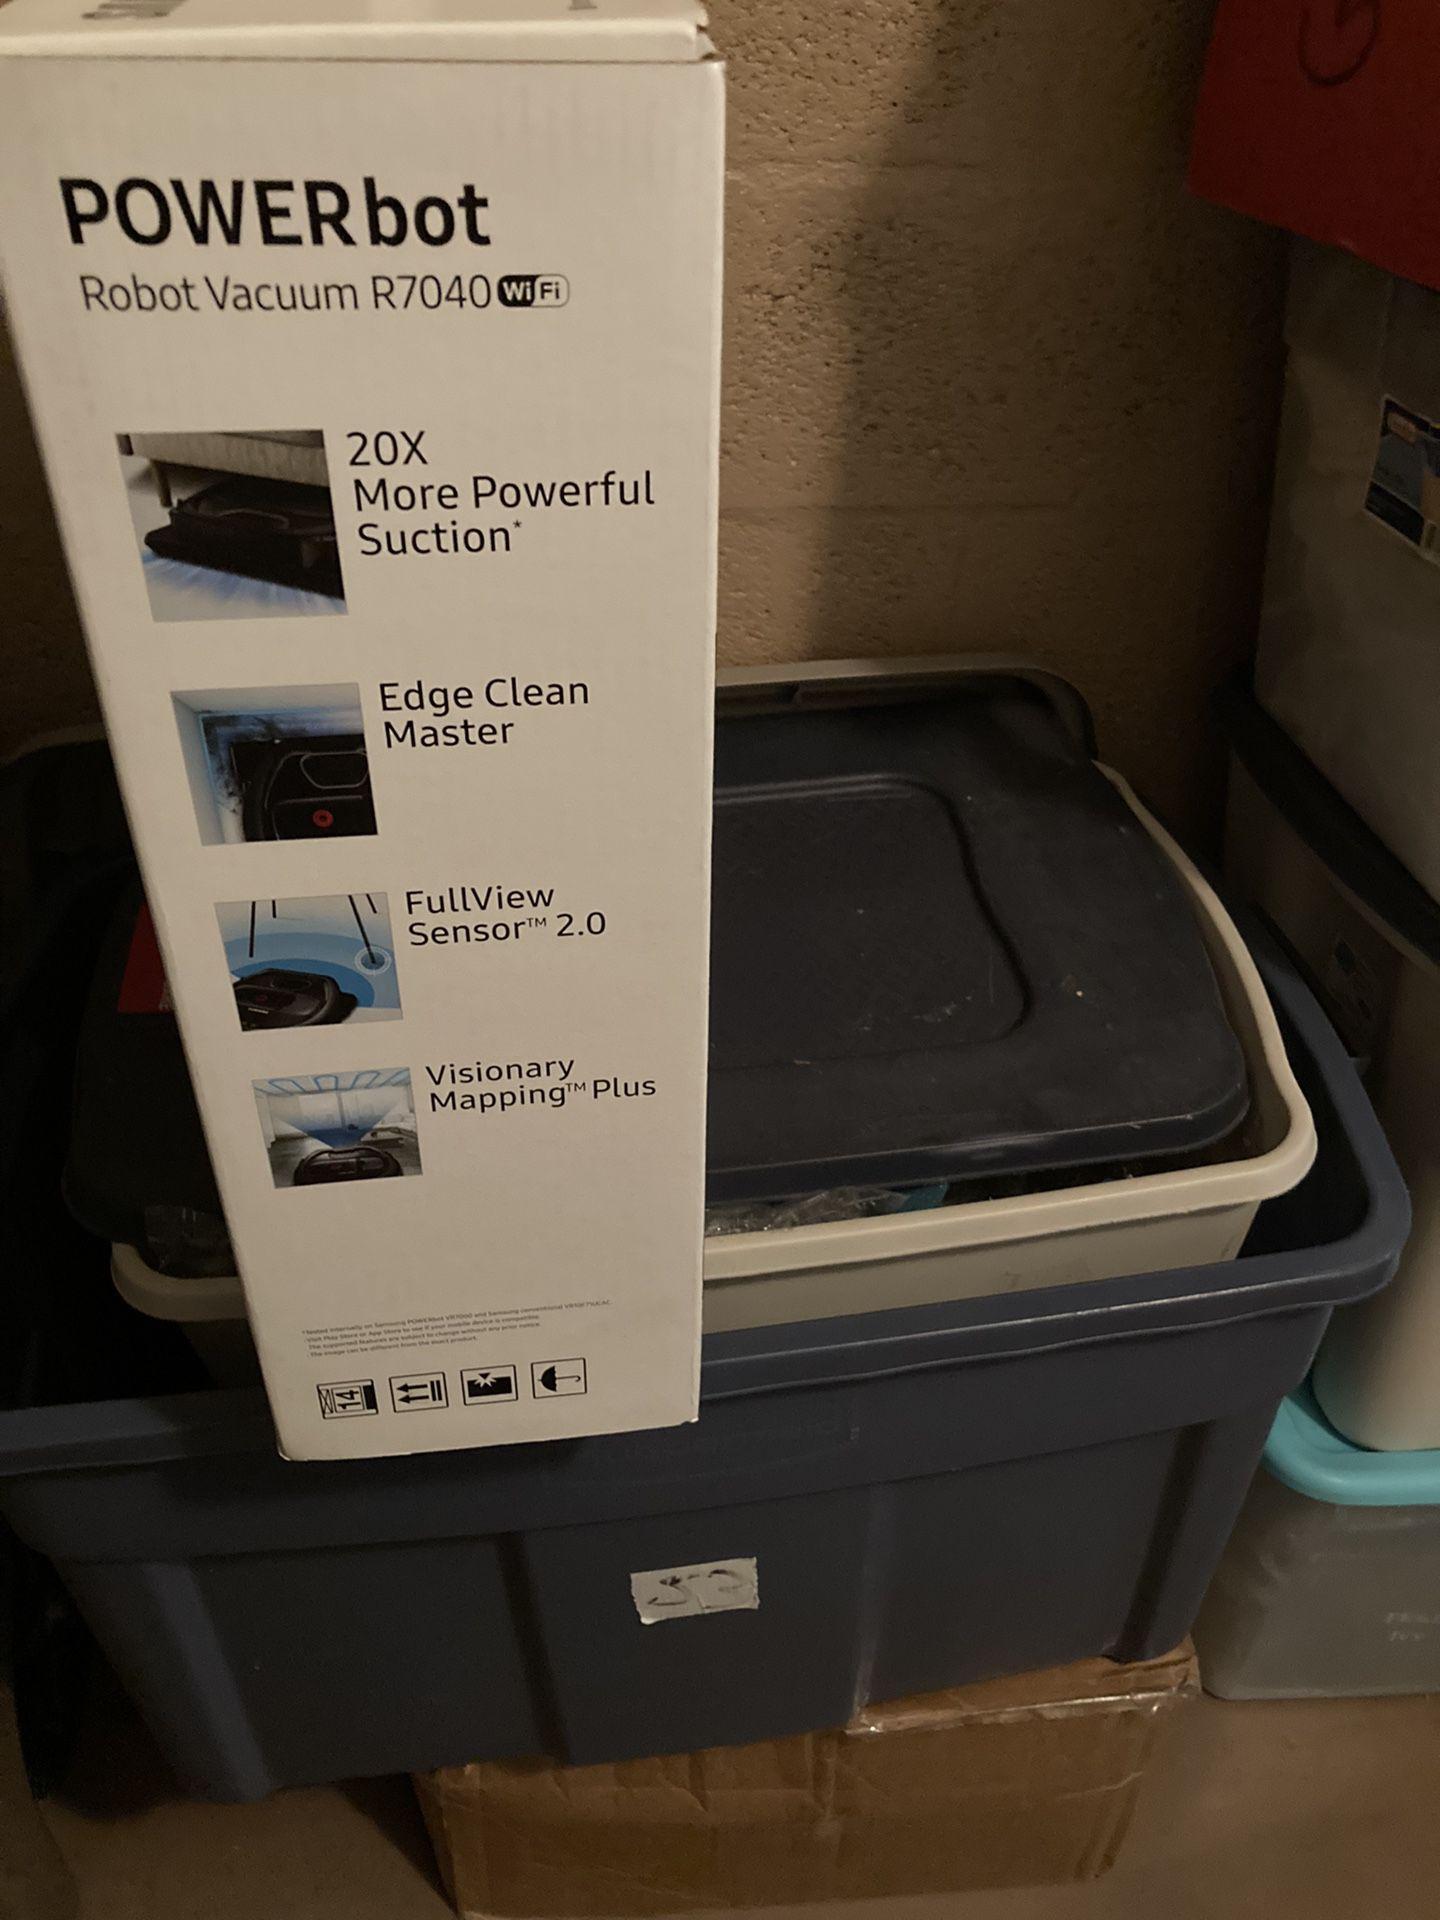 NEW Vacuum Samsung Powerbot R7040 Robot